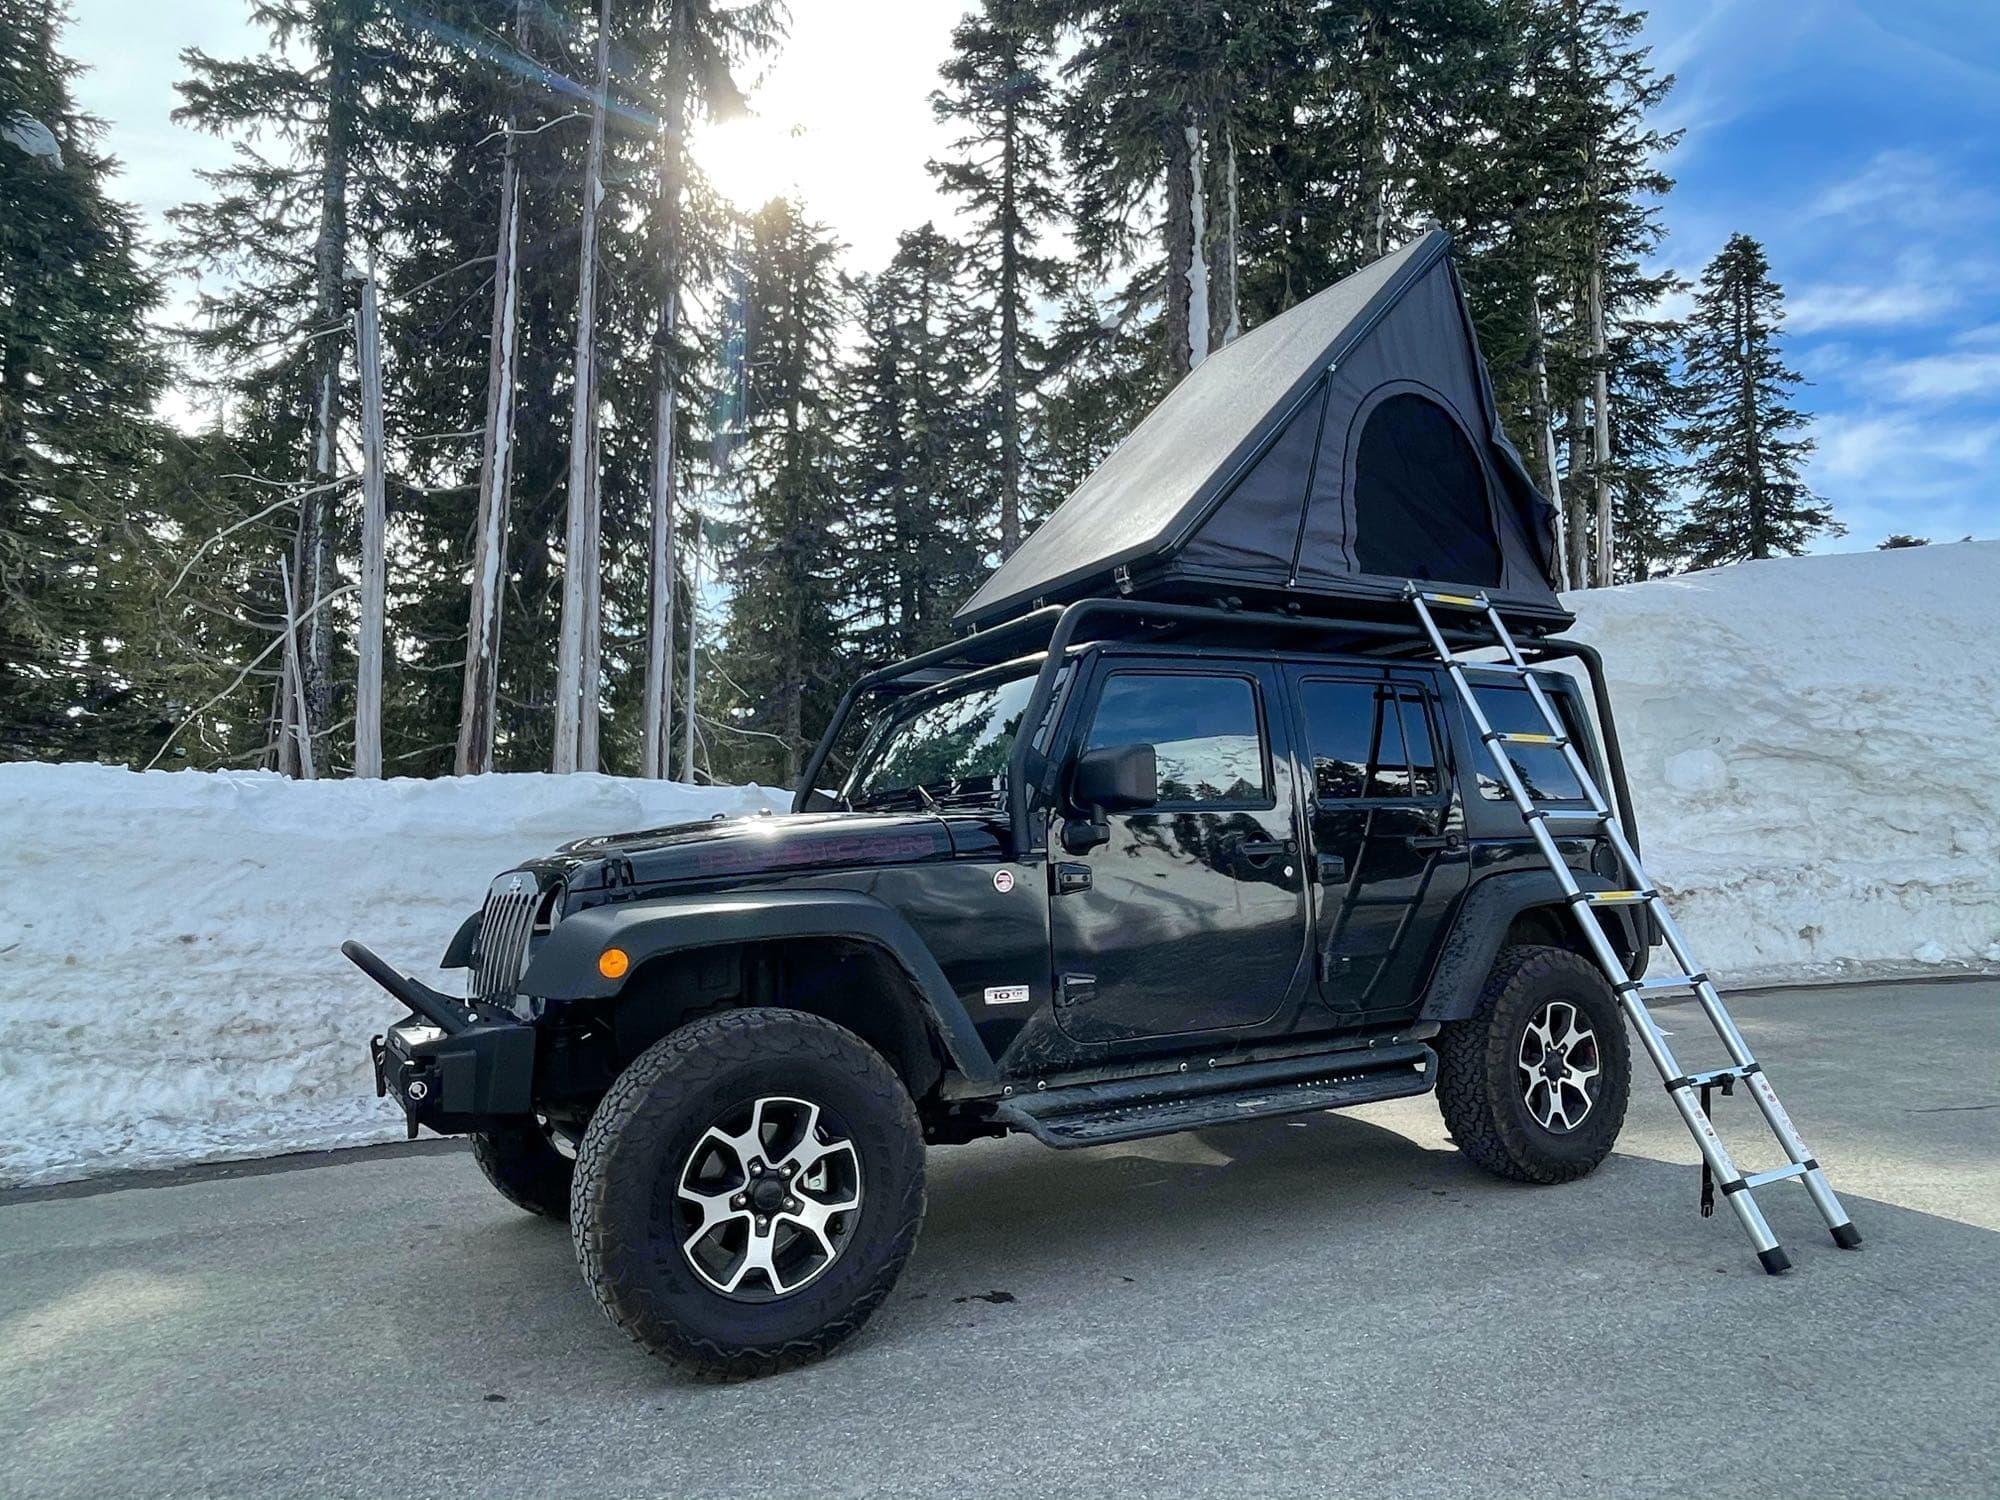 Jeep Wrangler Unlimited Rubicon 2013